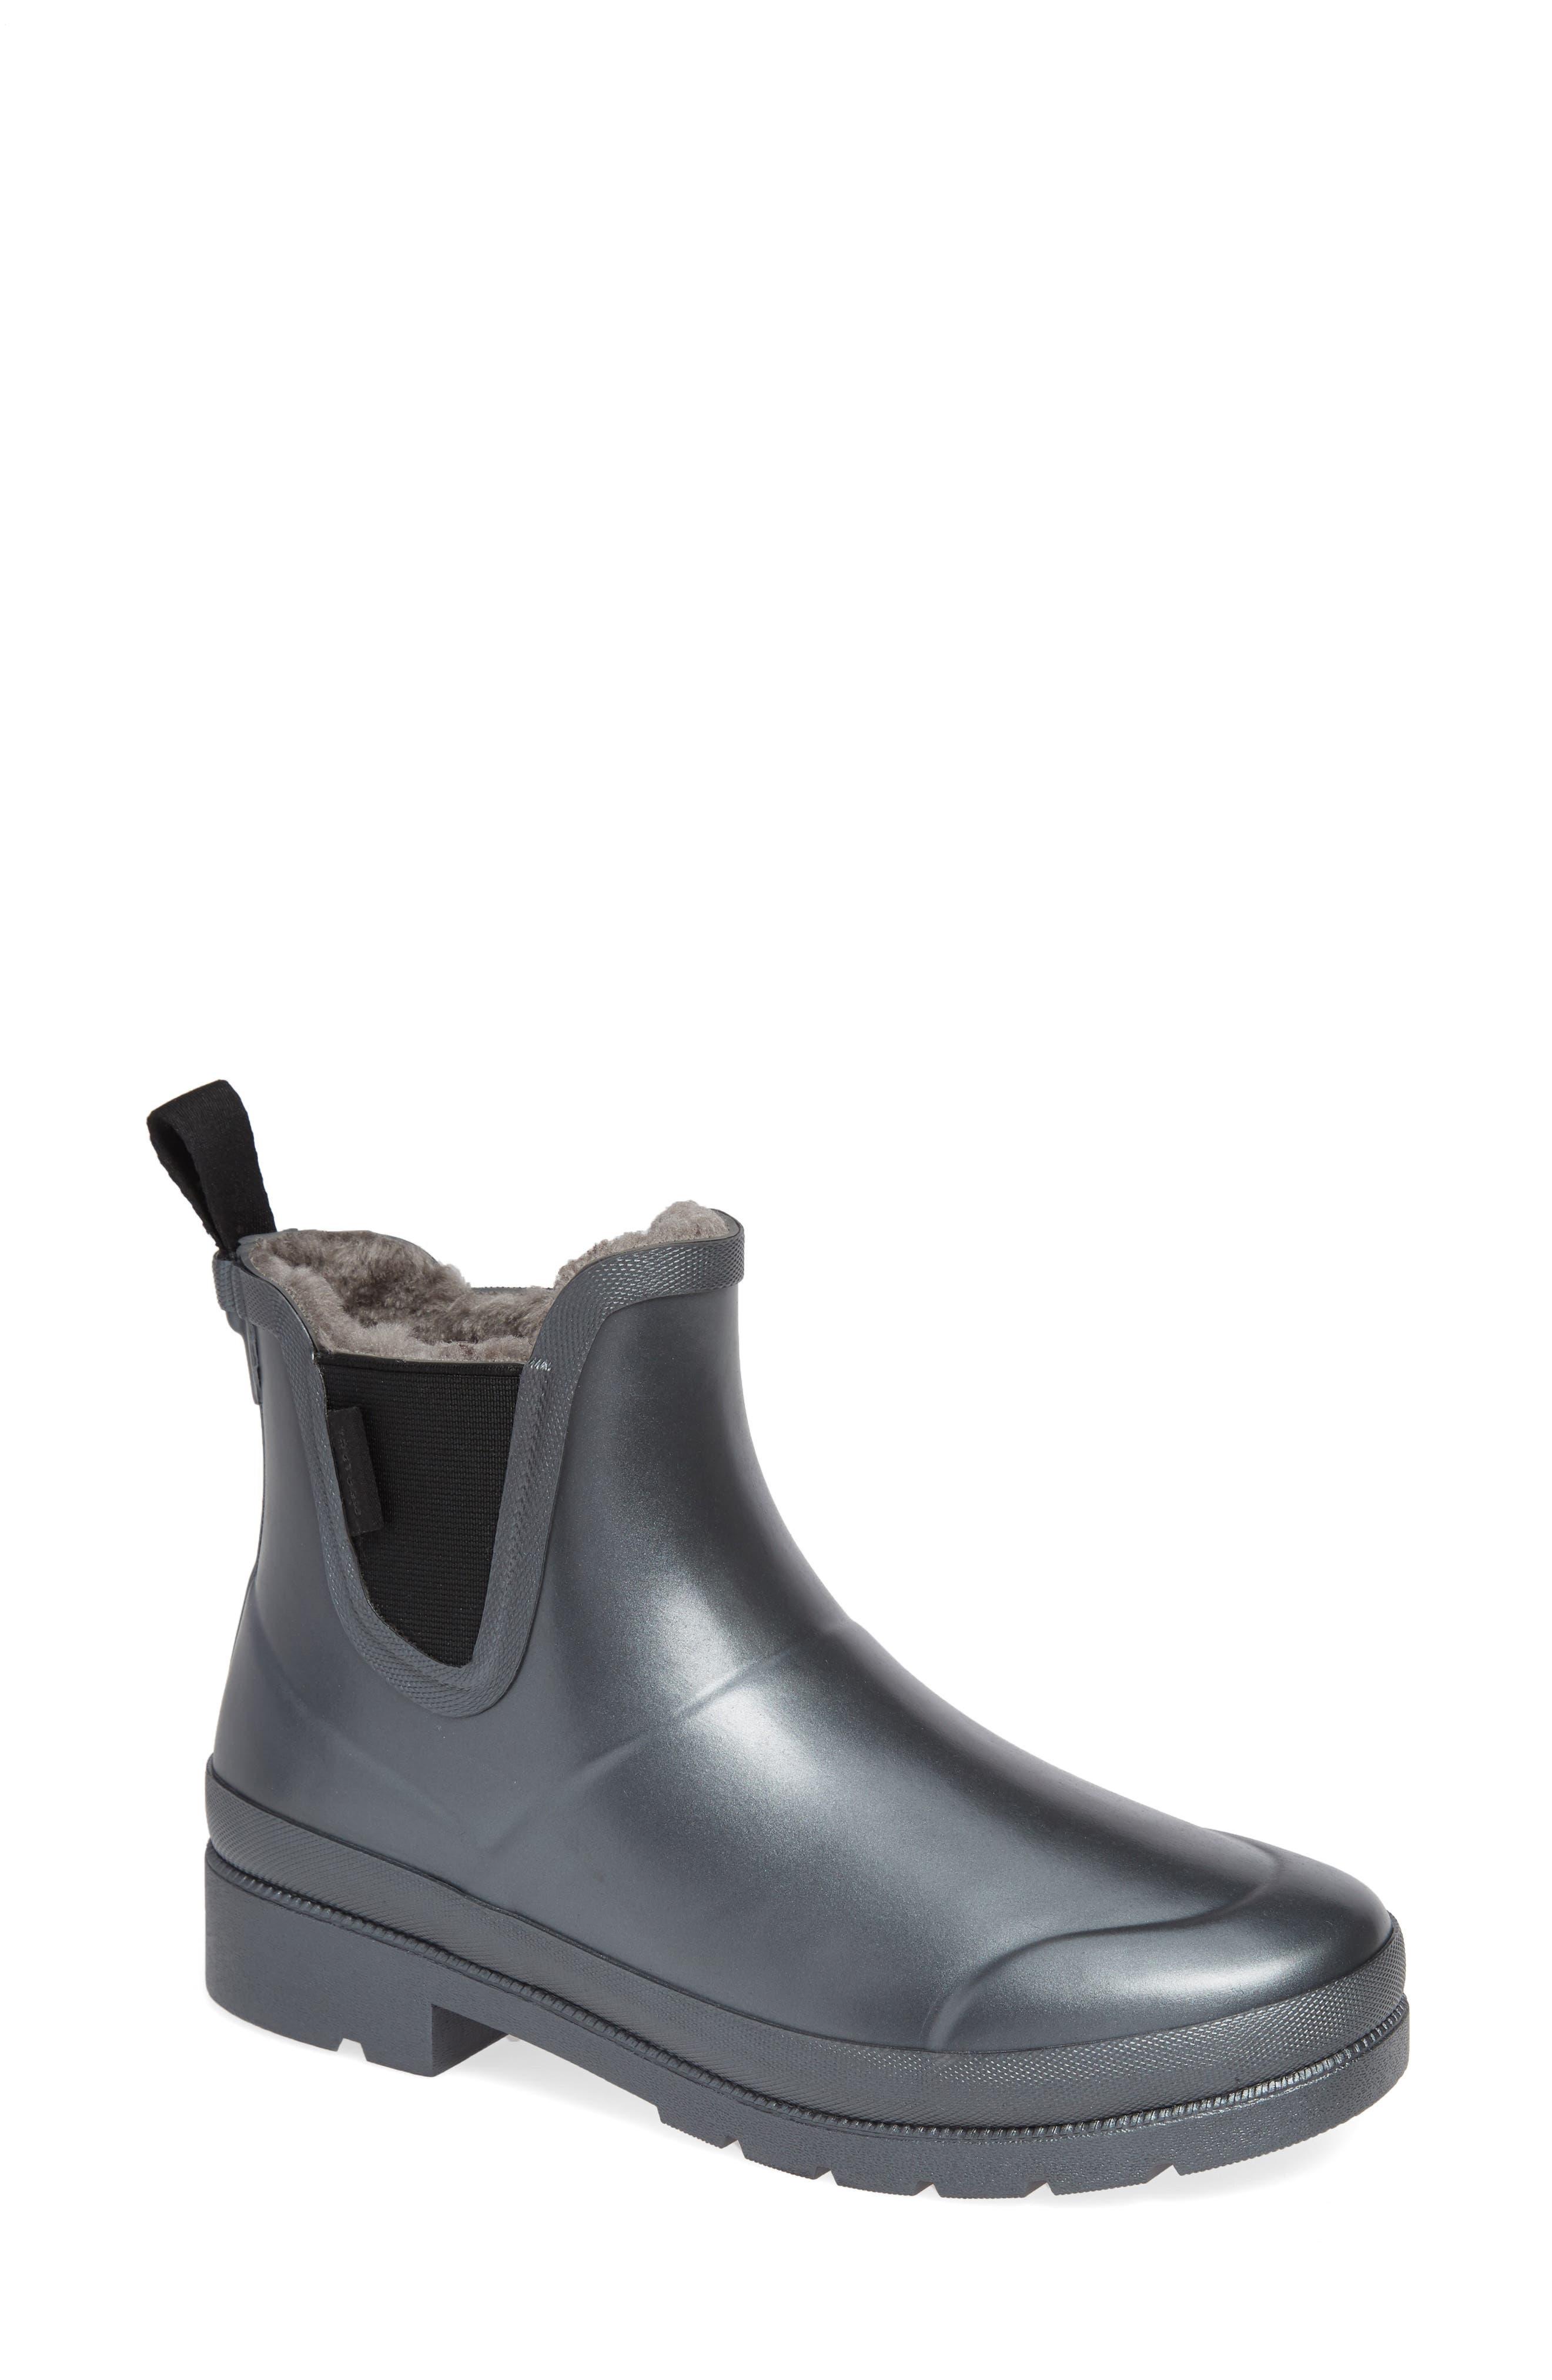 TRETORN Chelsea Rain Boot, Main, color, PEWTER